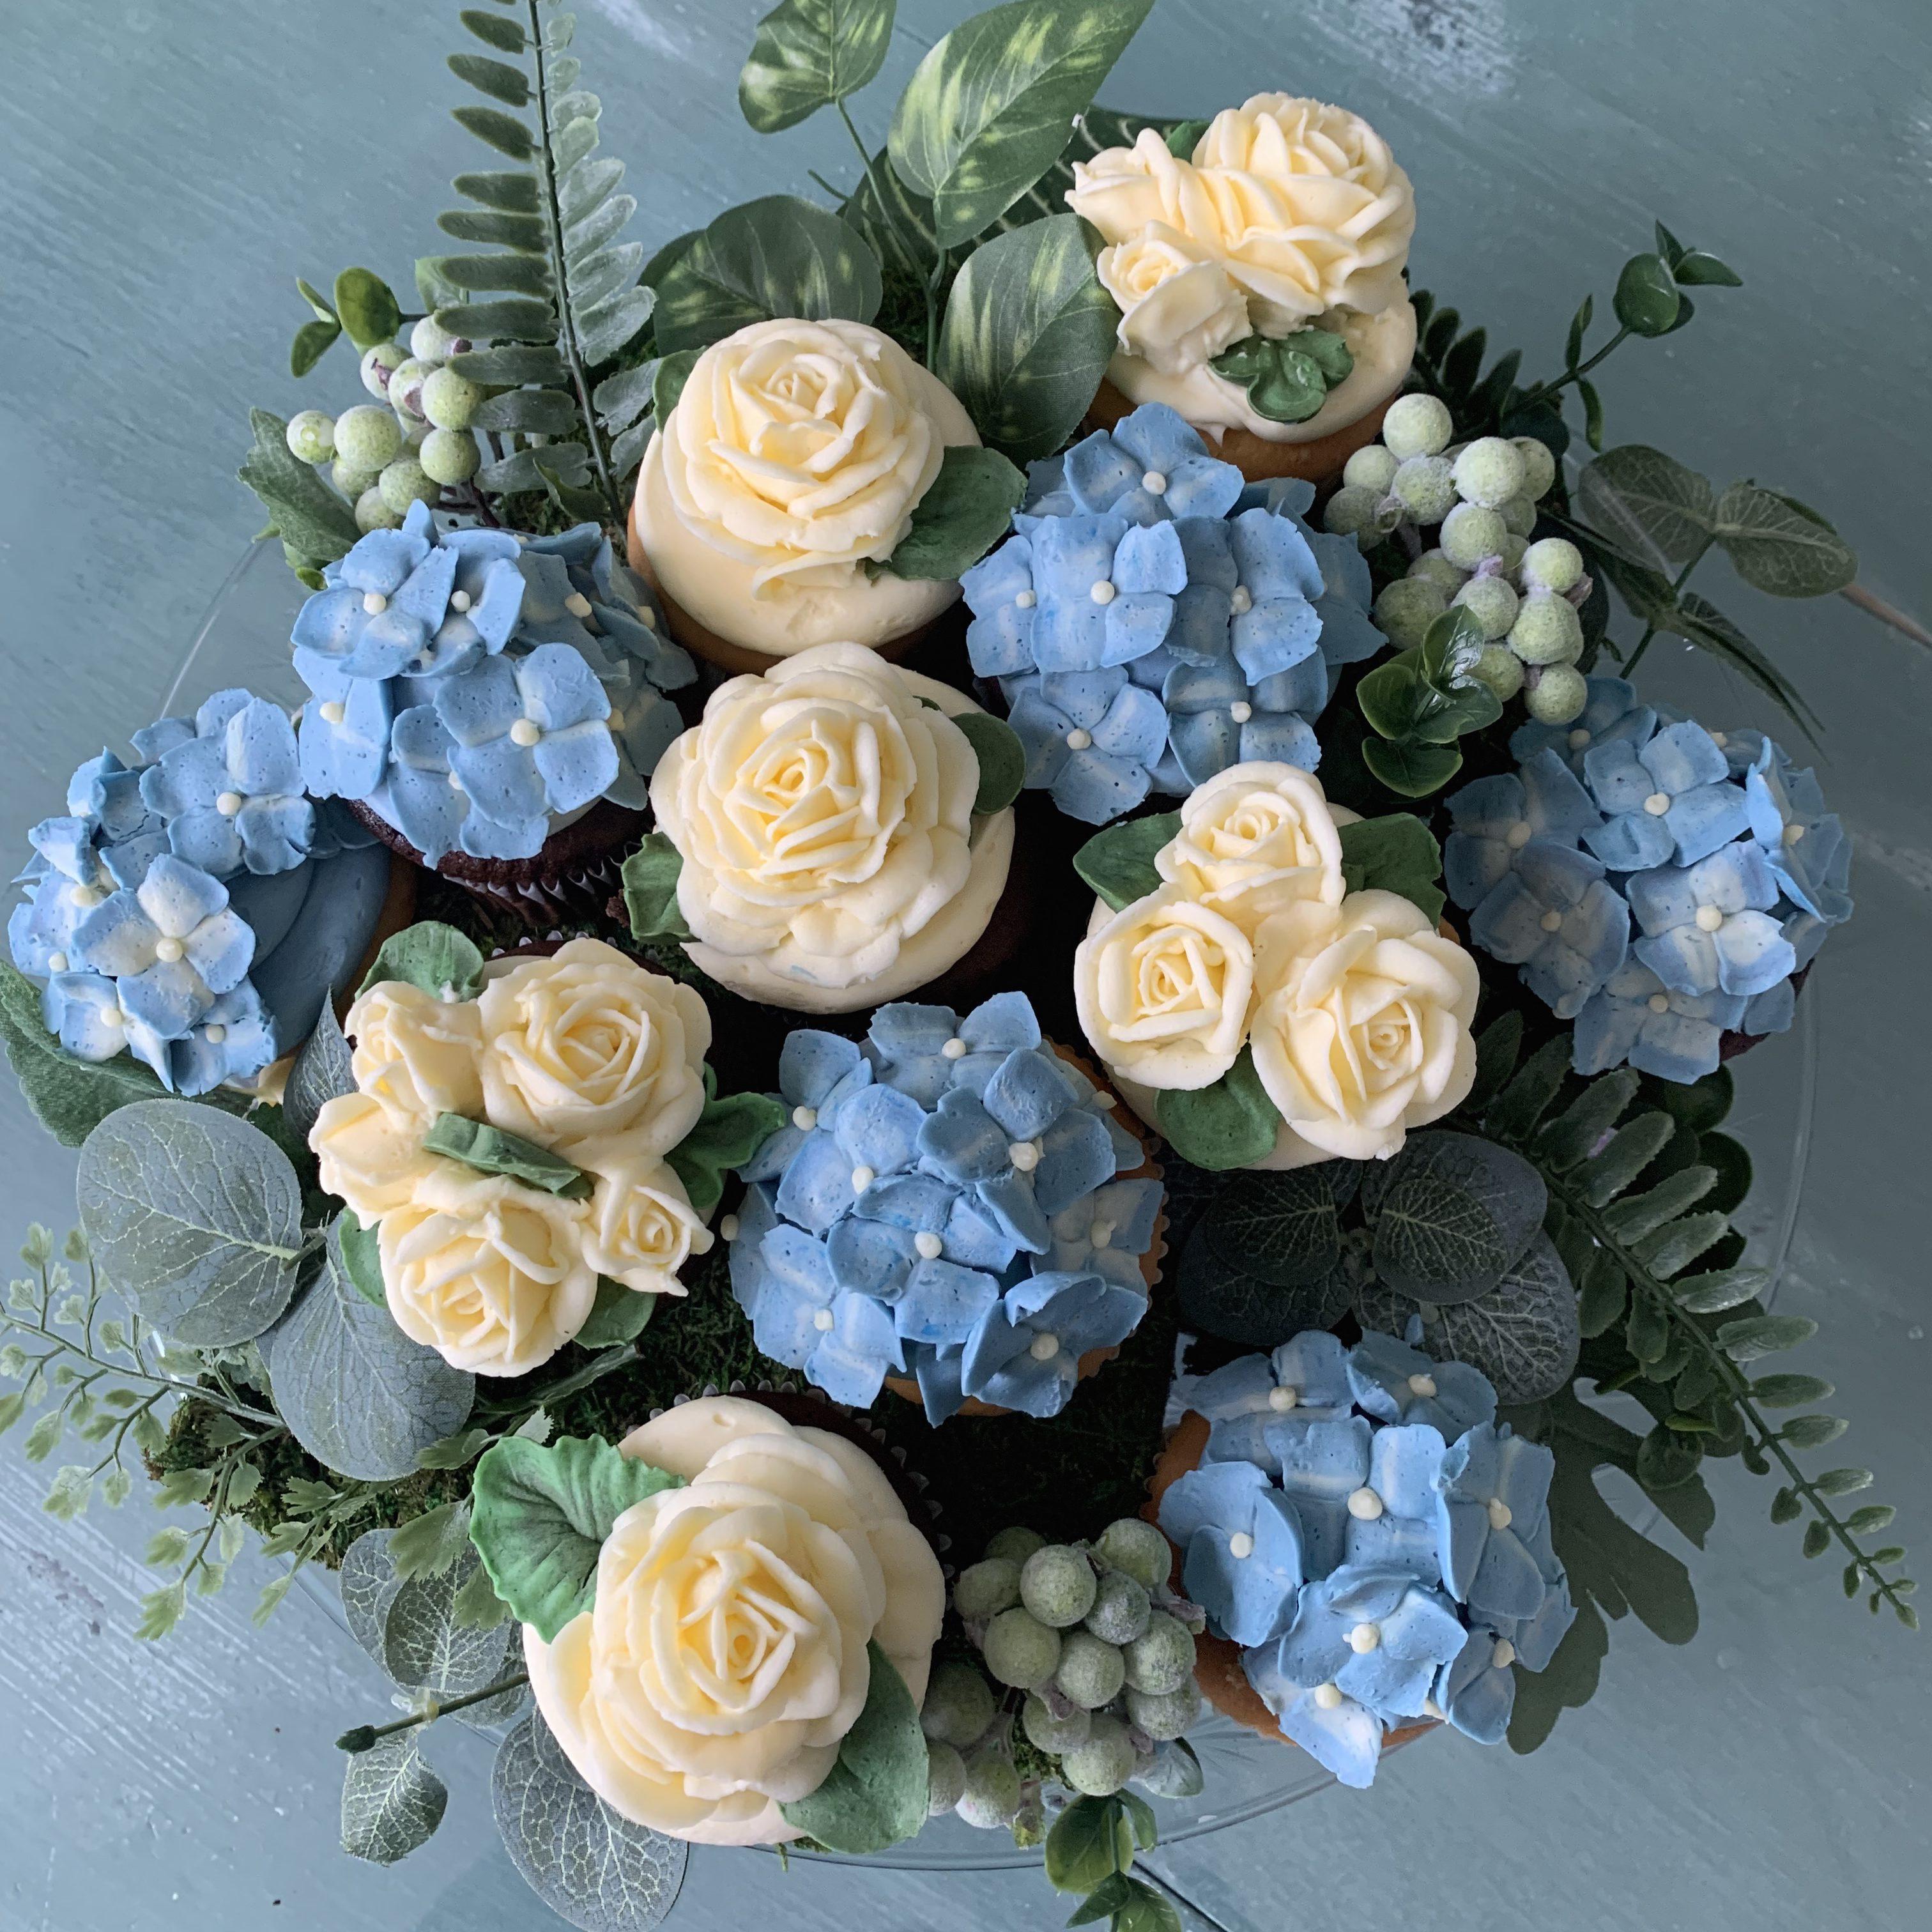 http://delicatelydelicious.com/wp-content/uploads/2019/05/White-Roses-and-Hydrangeas-e1558371032488.jpg